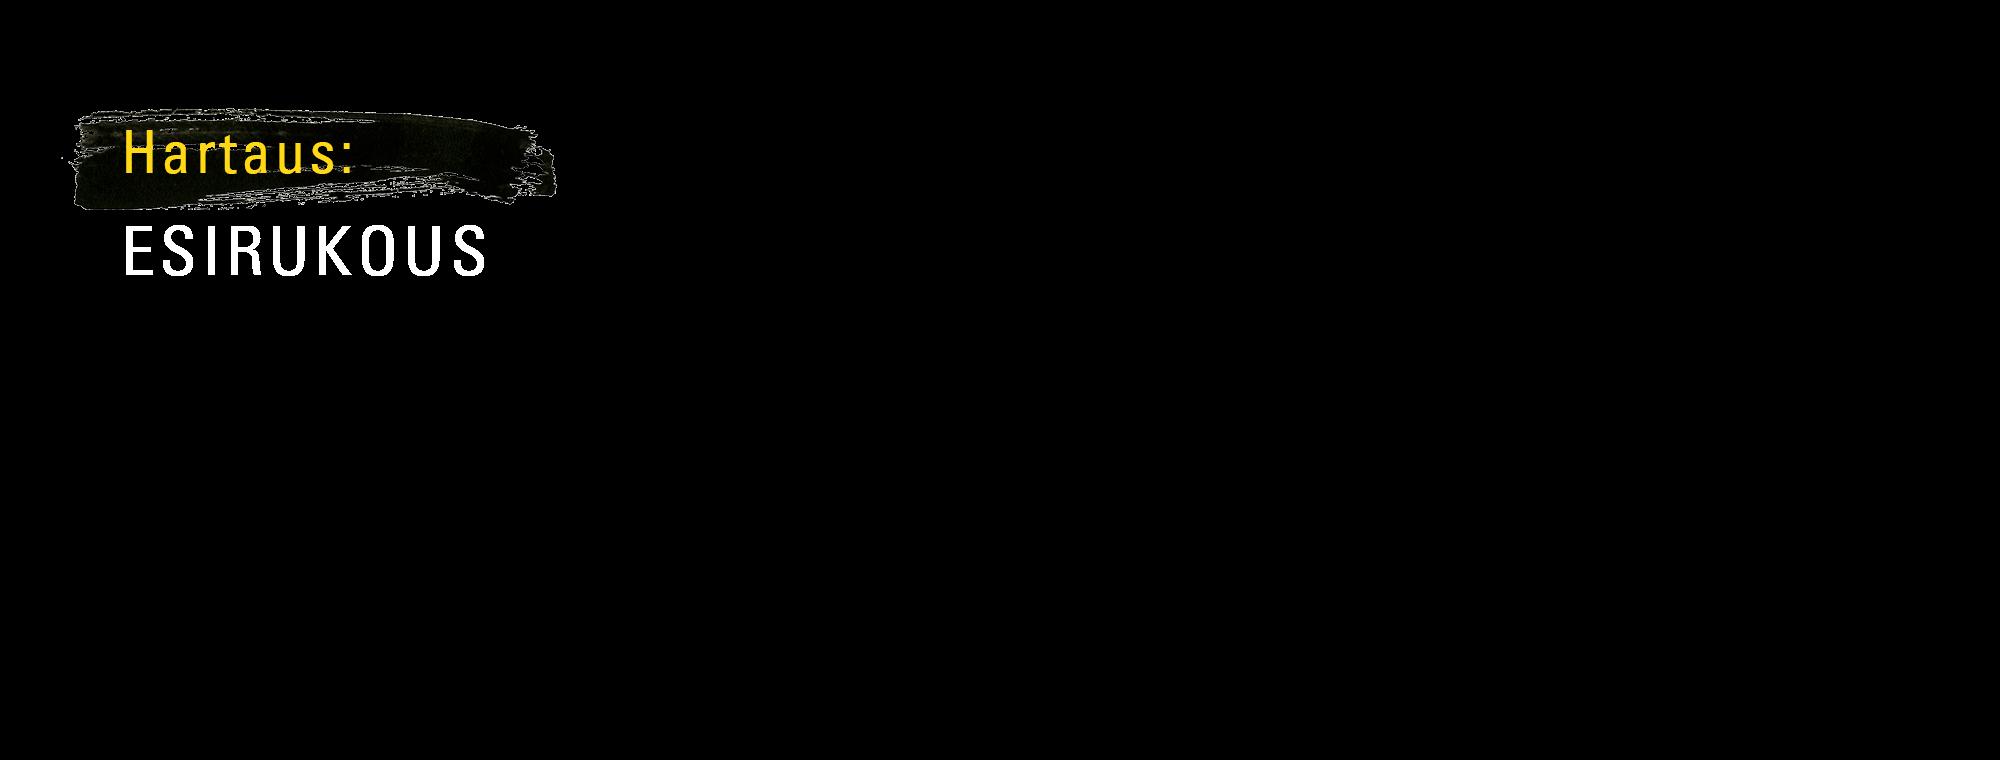 Esirukous